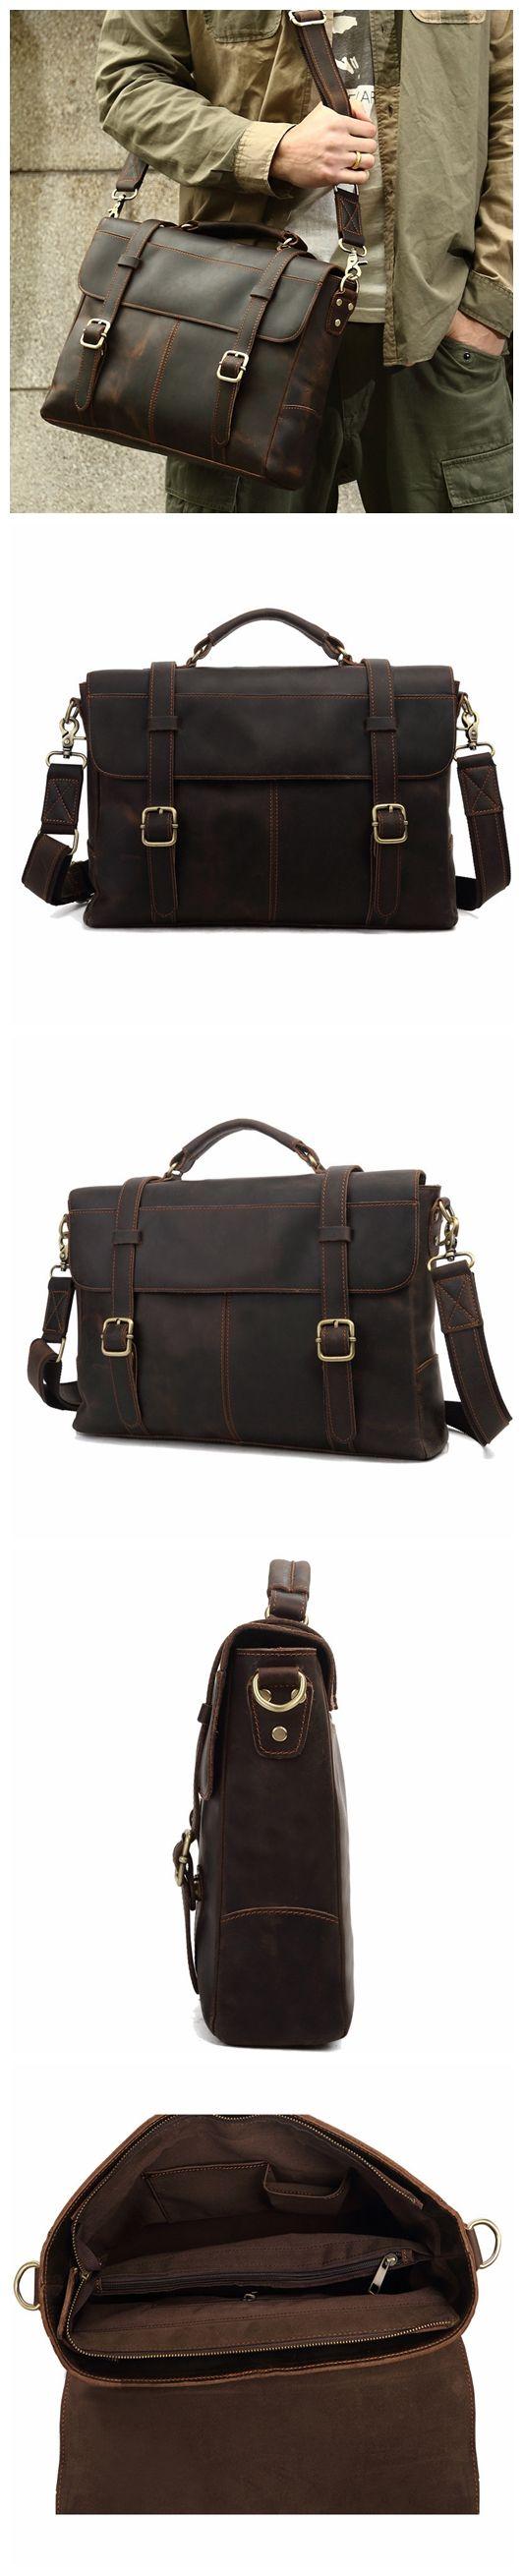 ROCKCOW Crazy Horse Leather Briefcase Messenger Bag Laptop Bag For Men 8657